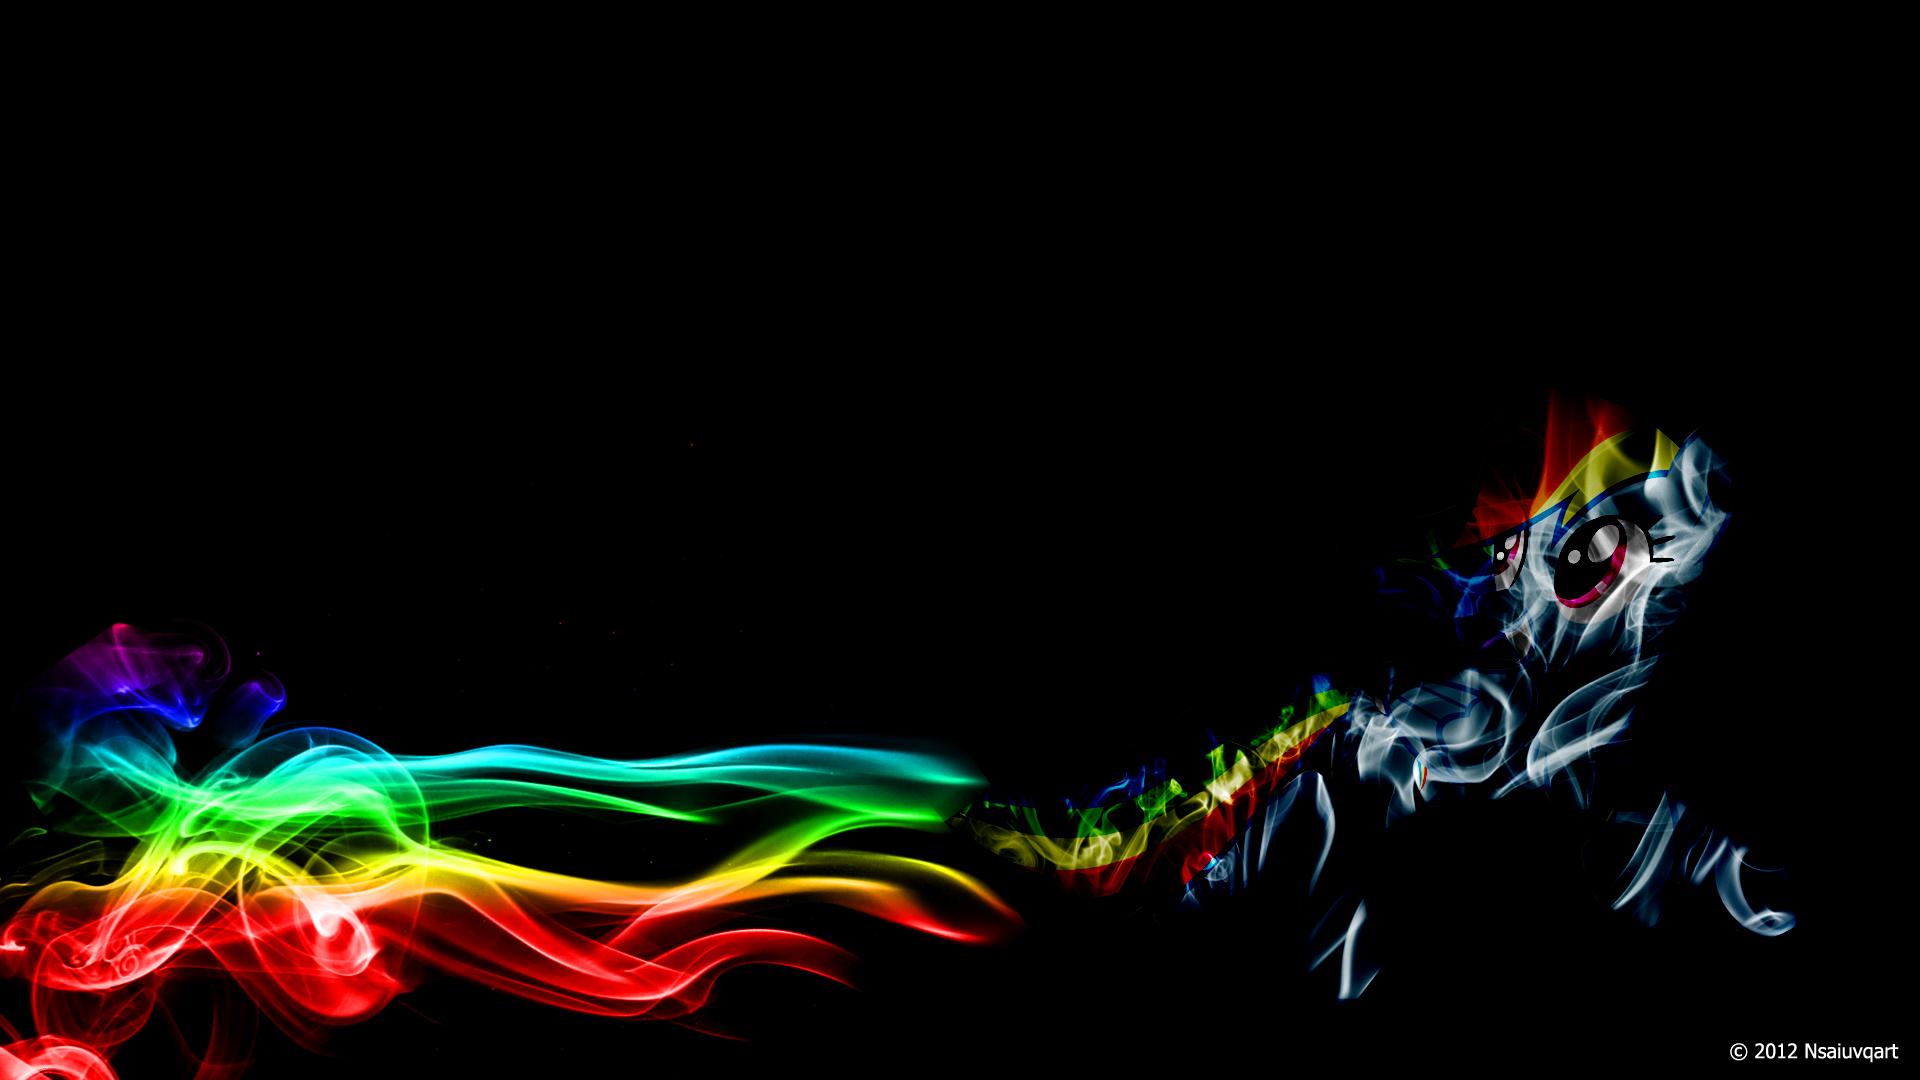 Rainbow Dash Light Wallpaper by nsaiuvqart